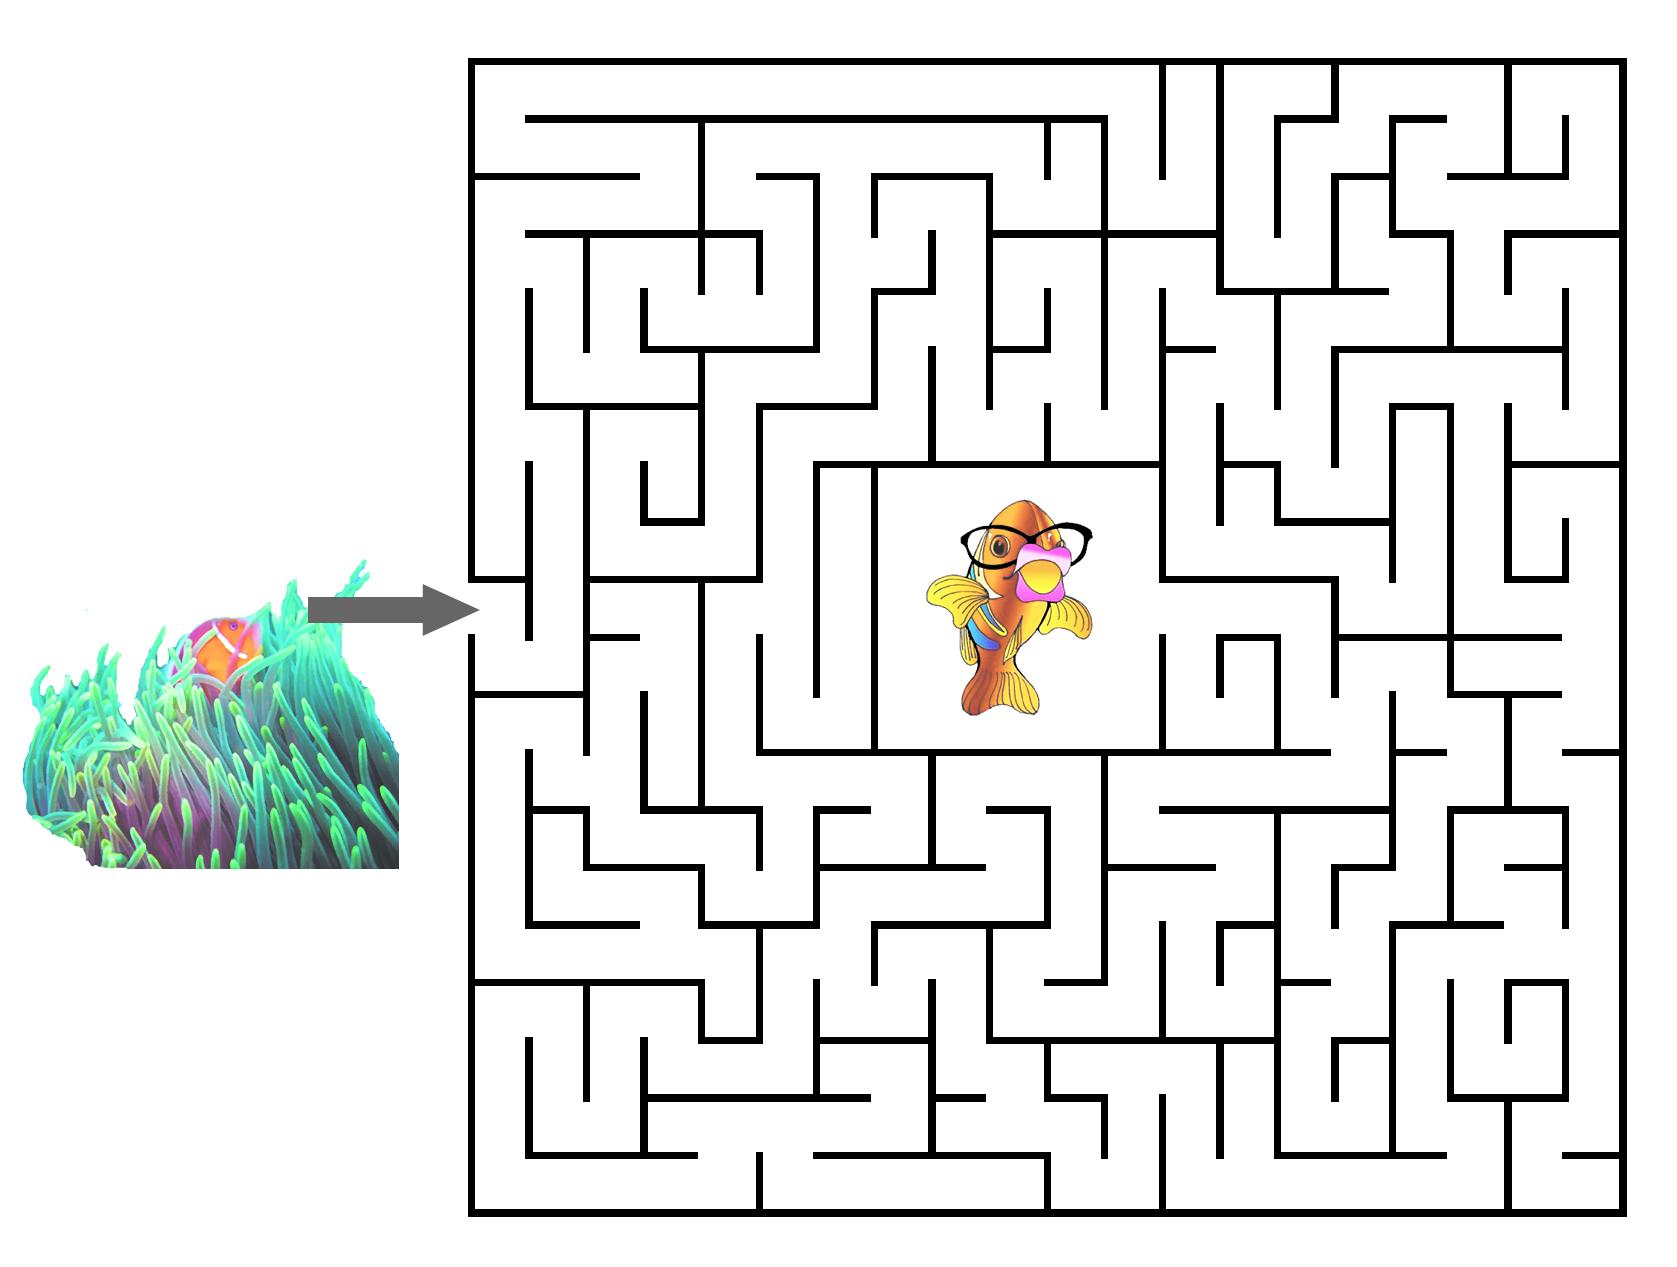 Hidden Picture Printable Maze Help Kika Find her way home